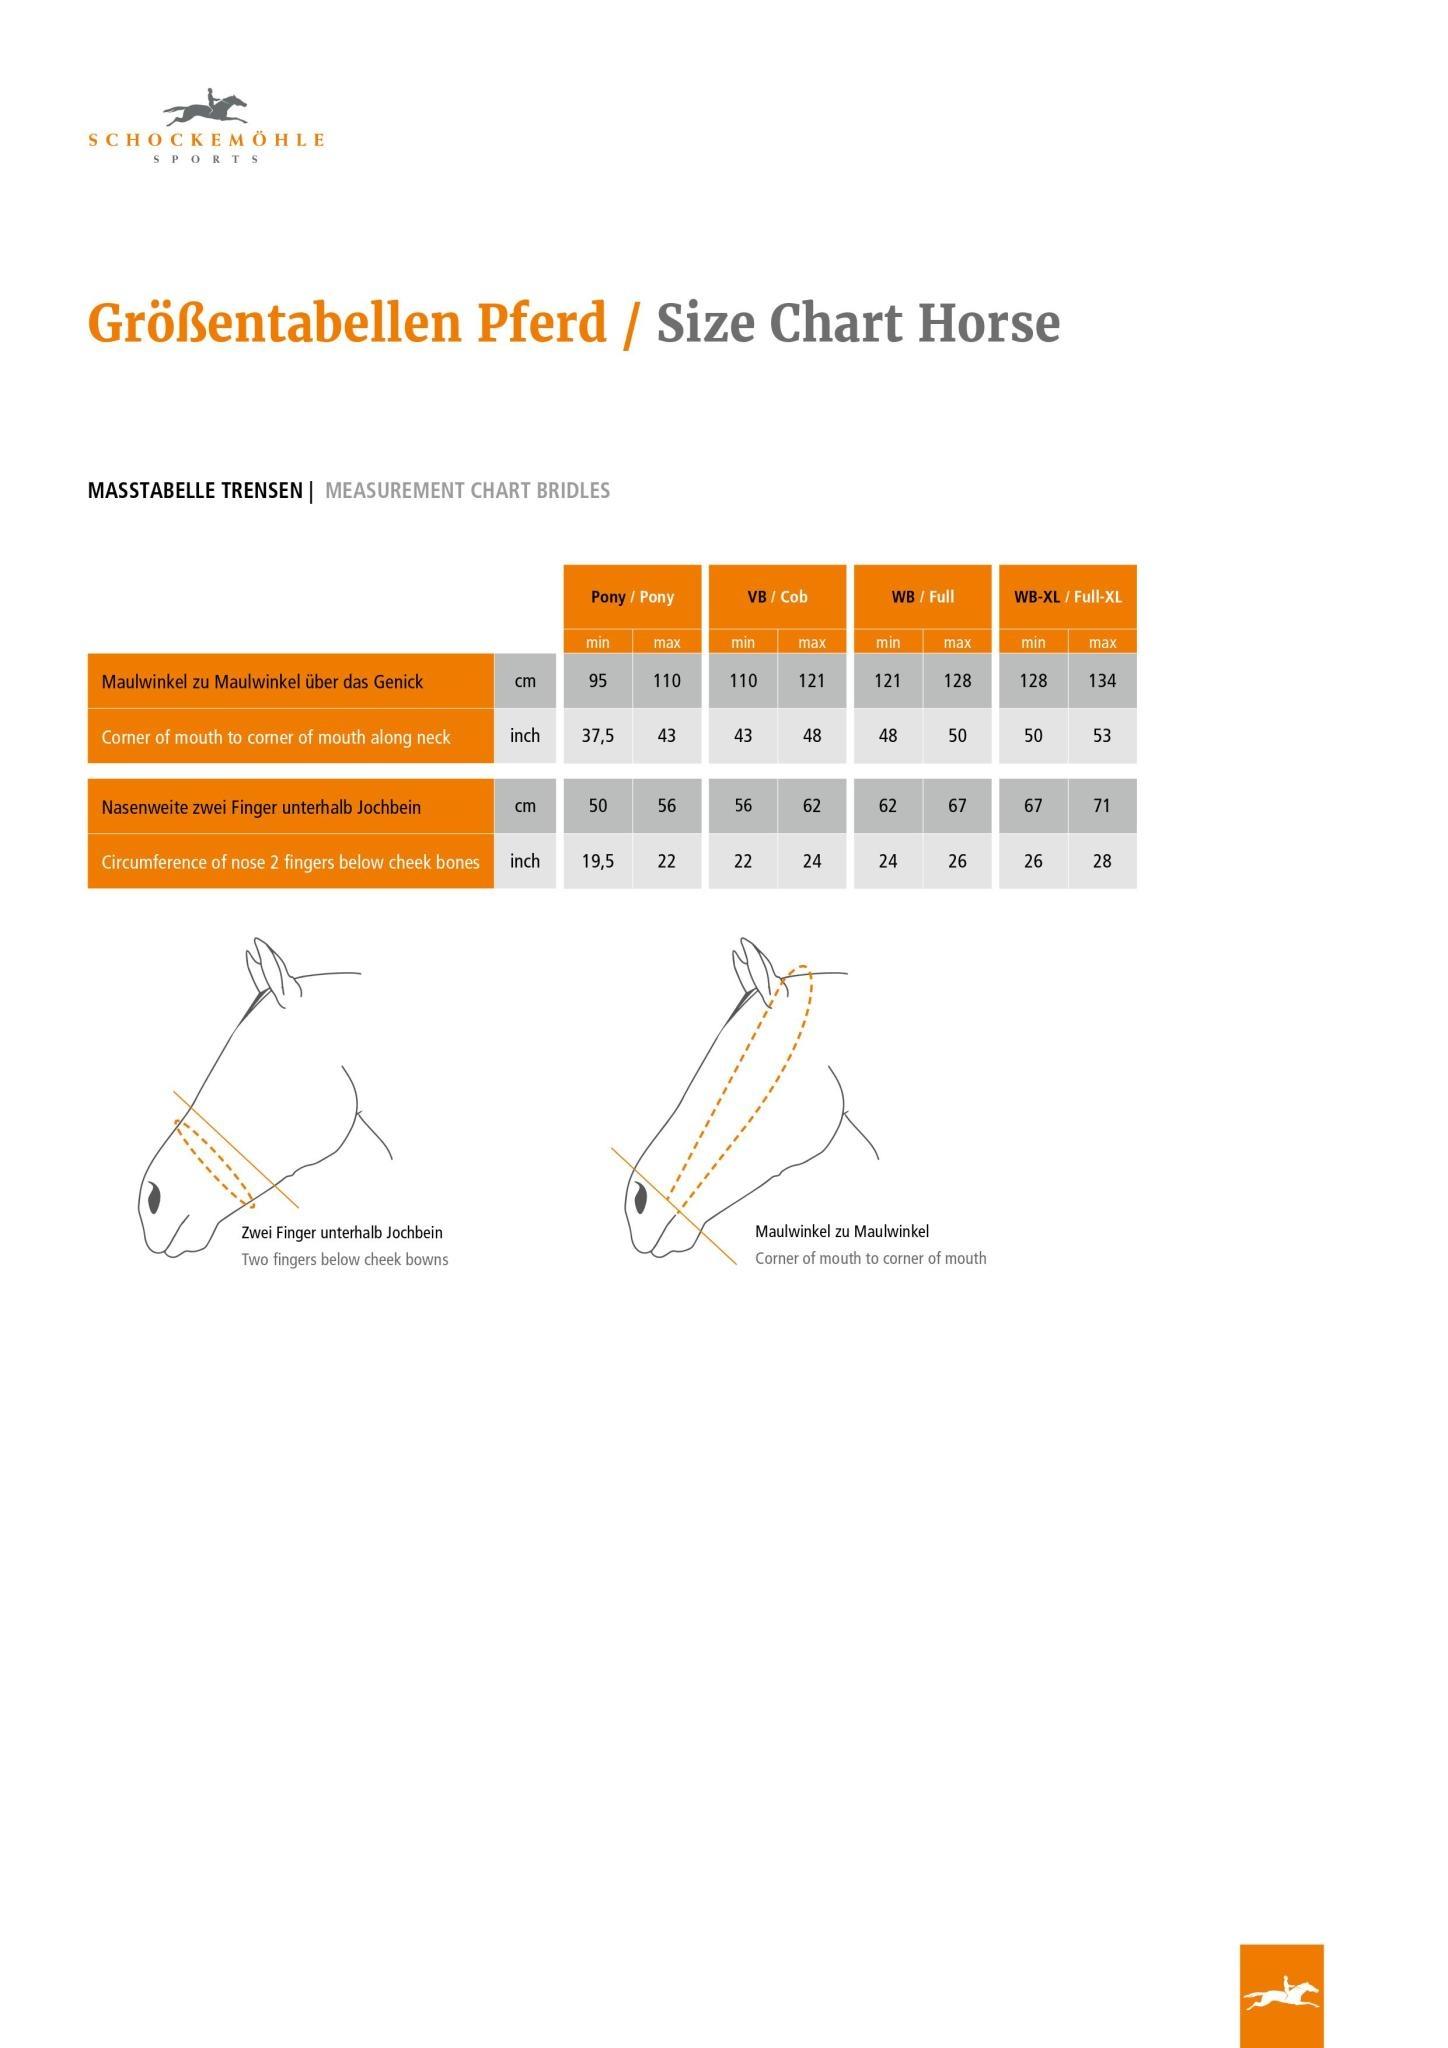 Schockemohle Schockemohle Montreal Select Anatomic Hunter Bridle  oak/cream/silver, Full